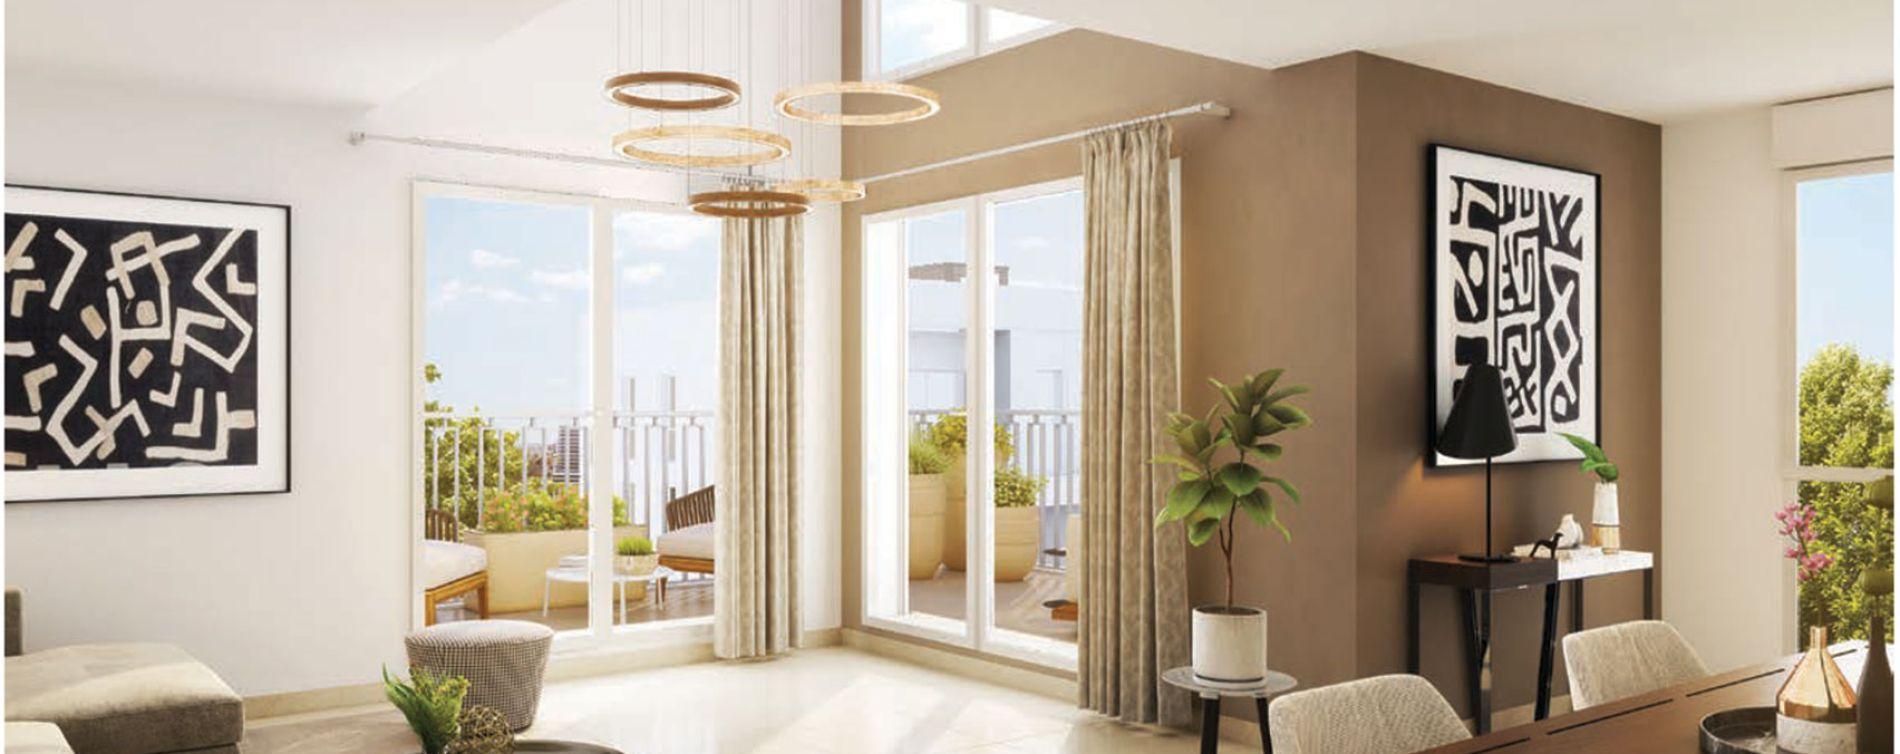 Villeurbanne : programme immobilier neuve « Crescendo » (2)